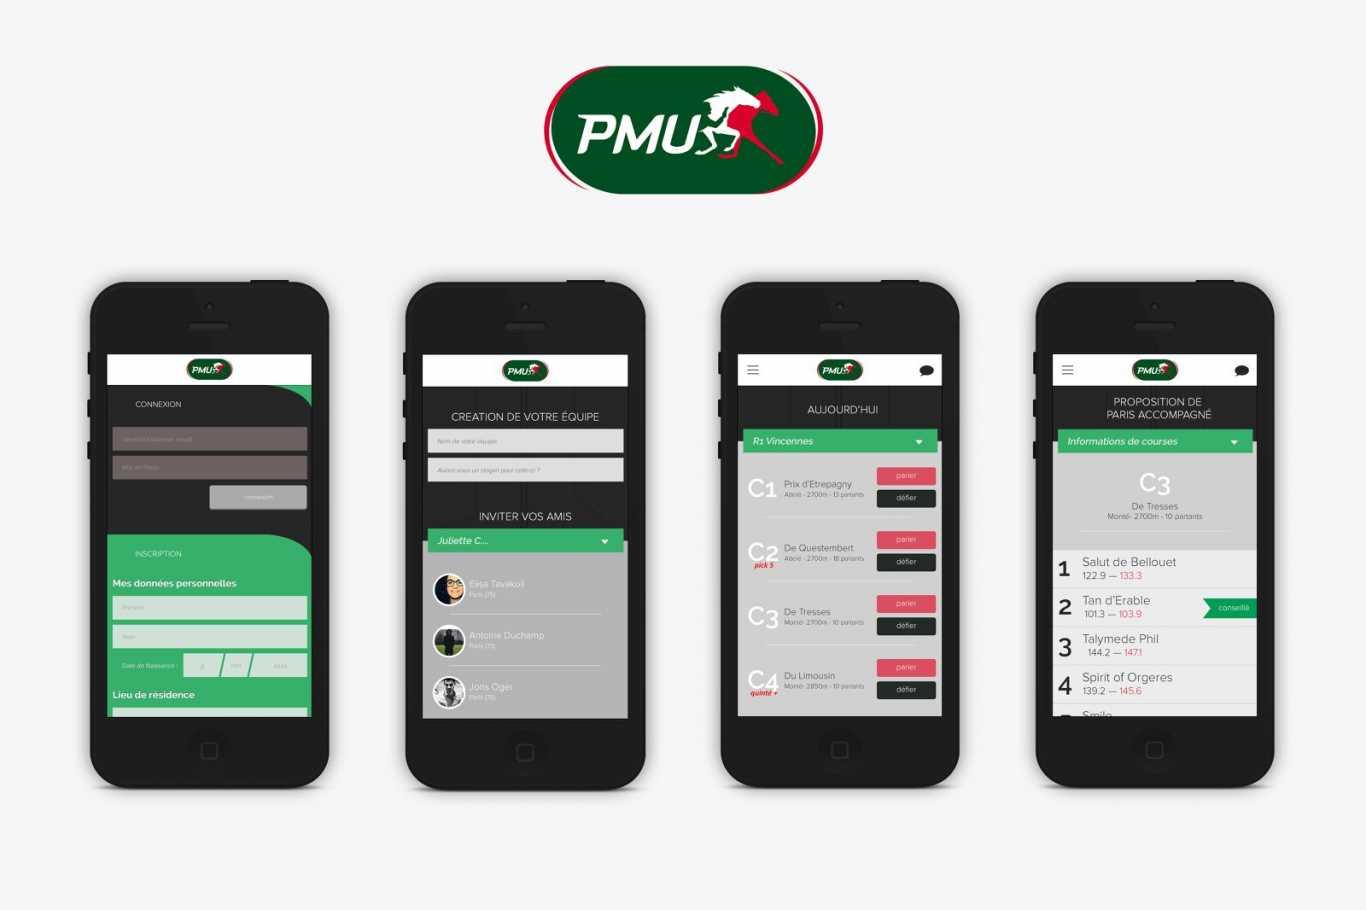 PMU parier mobile